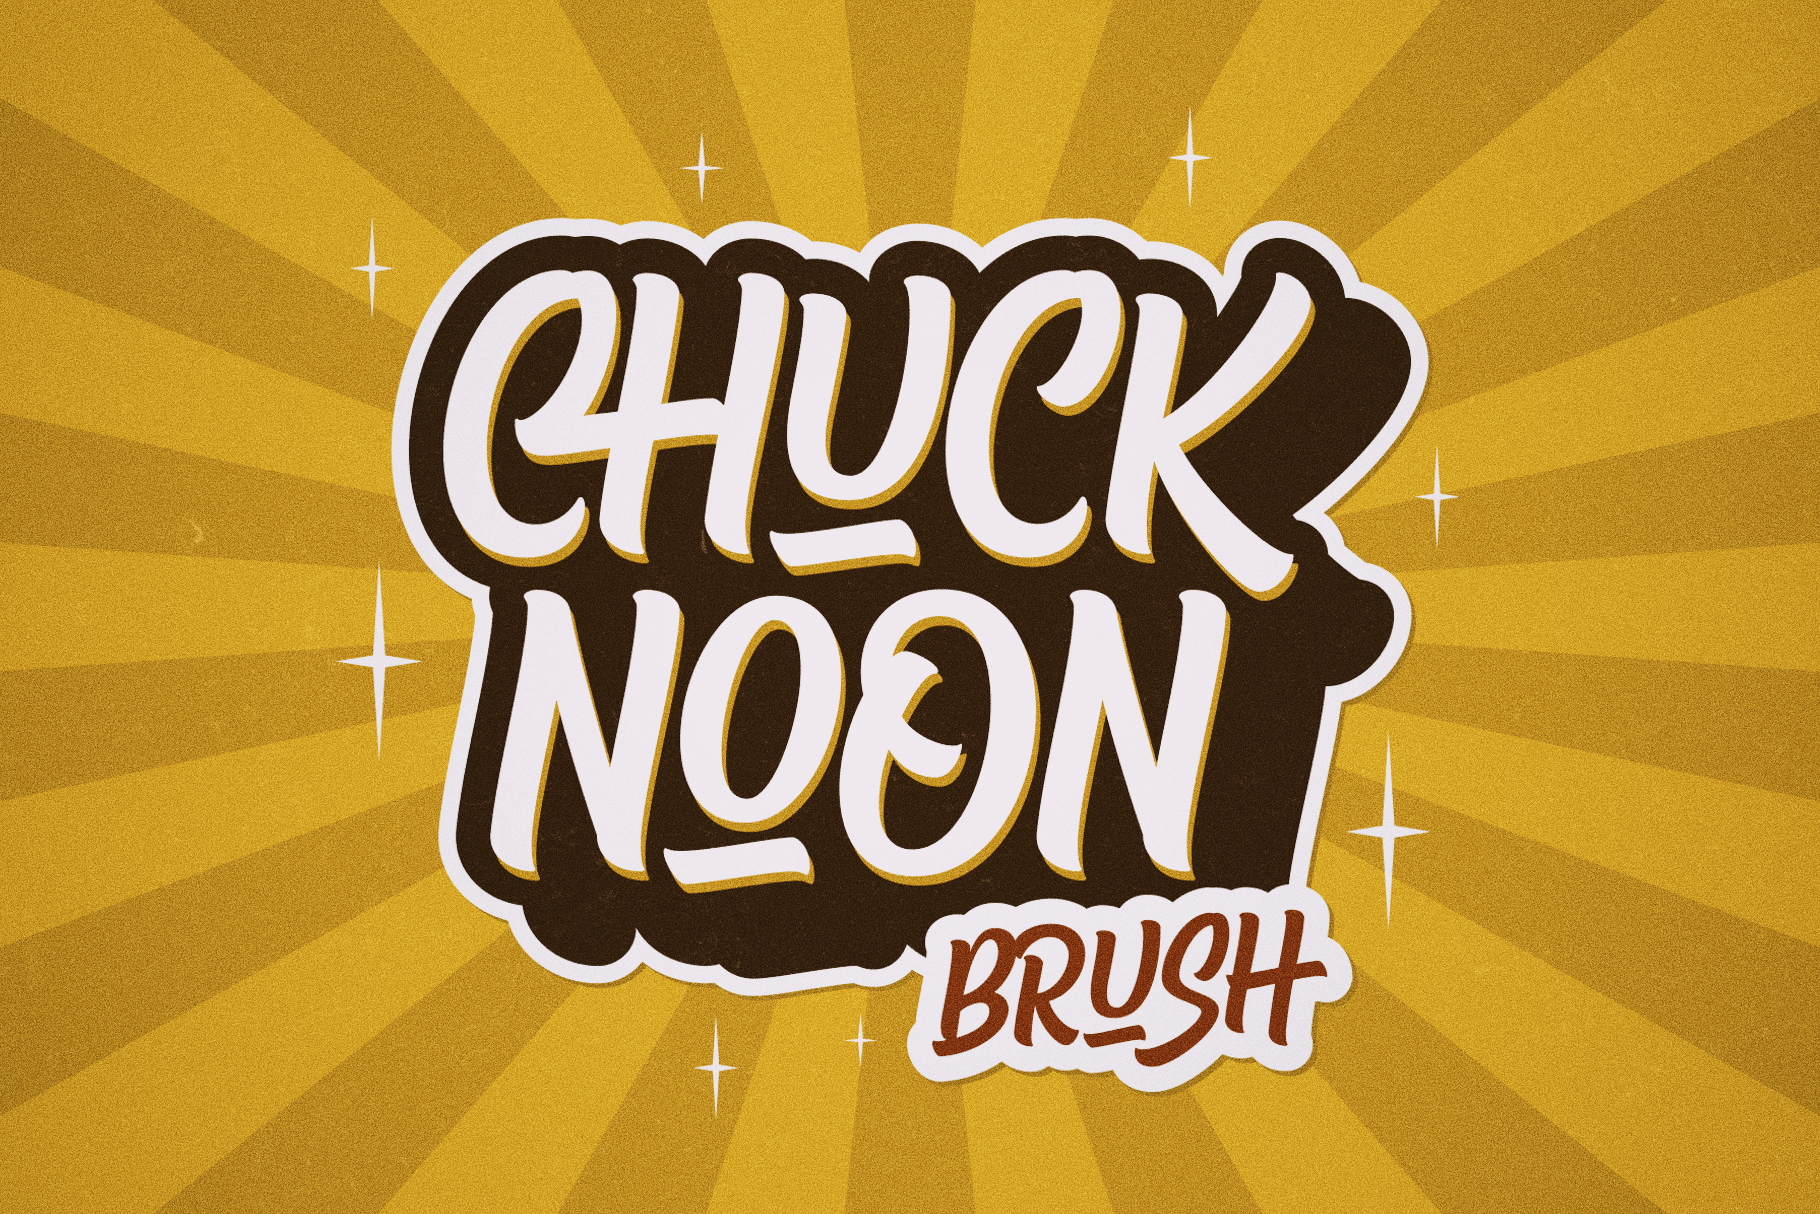 Chuck Noon Brush example image 2